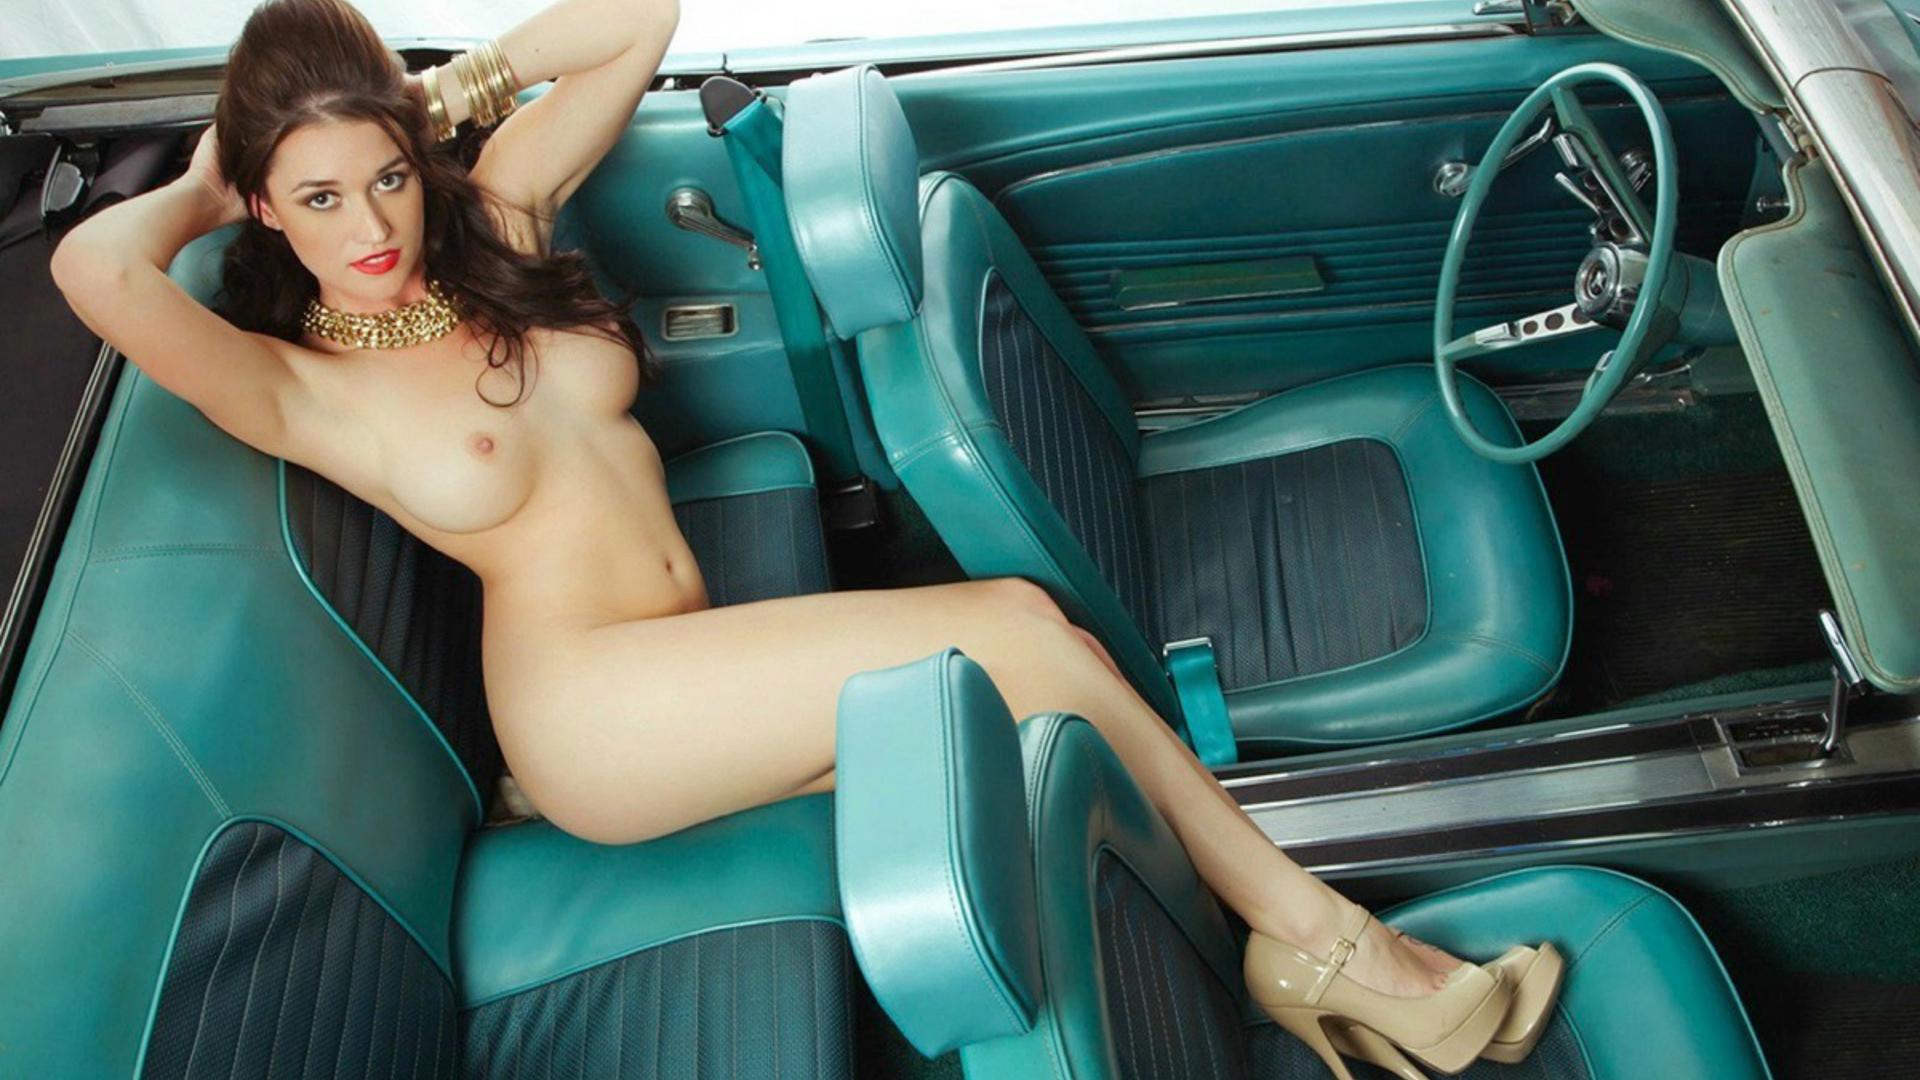 download photo 1920x1080, big tits, brunette, car, hard nipples